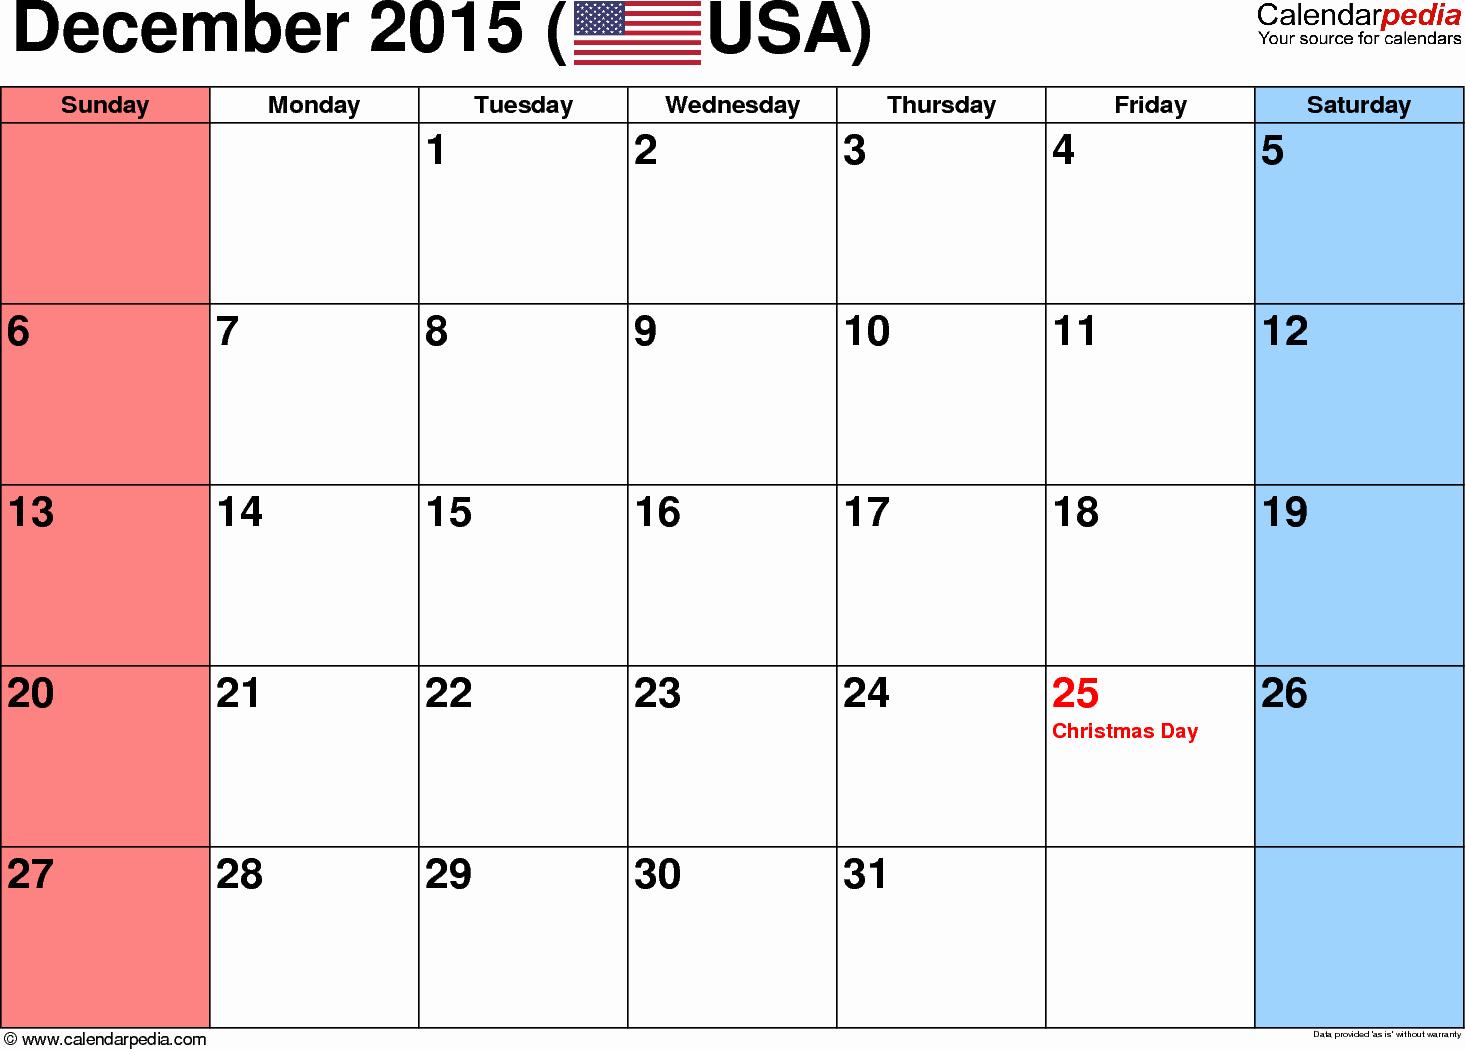 December 2015 Calendar Word Document New December 2015 Calendars for Word Excel & Pdf